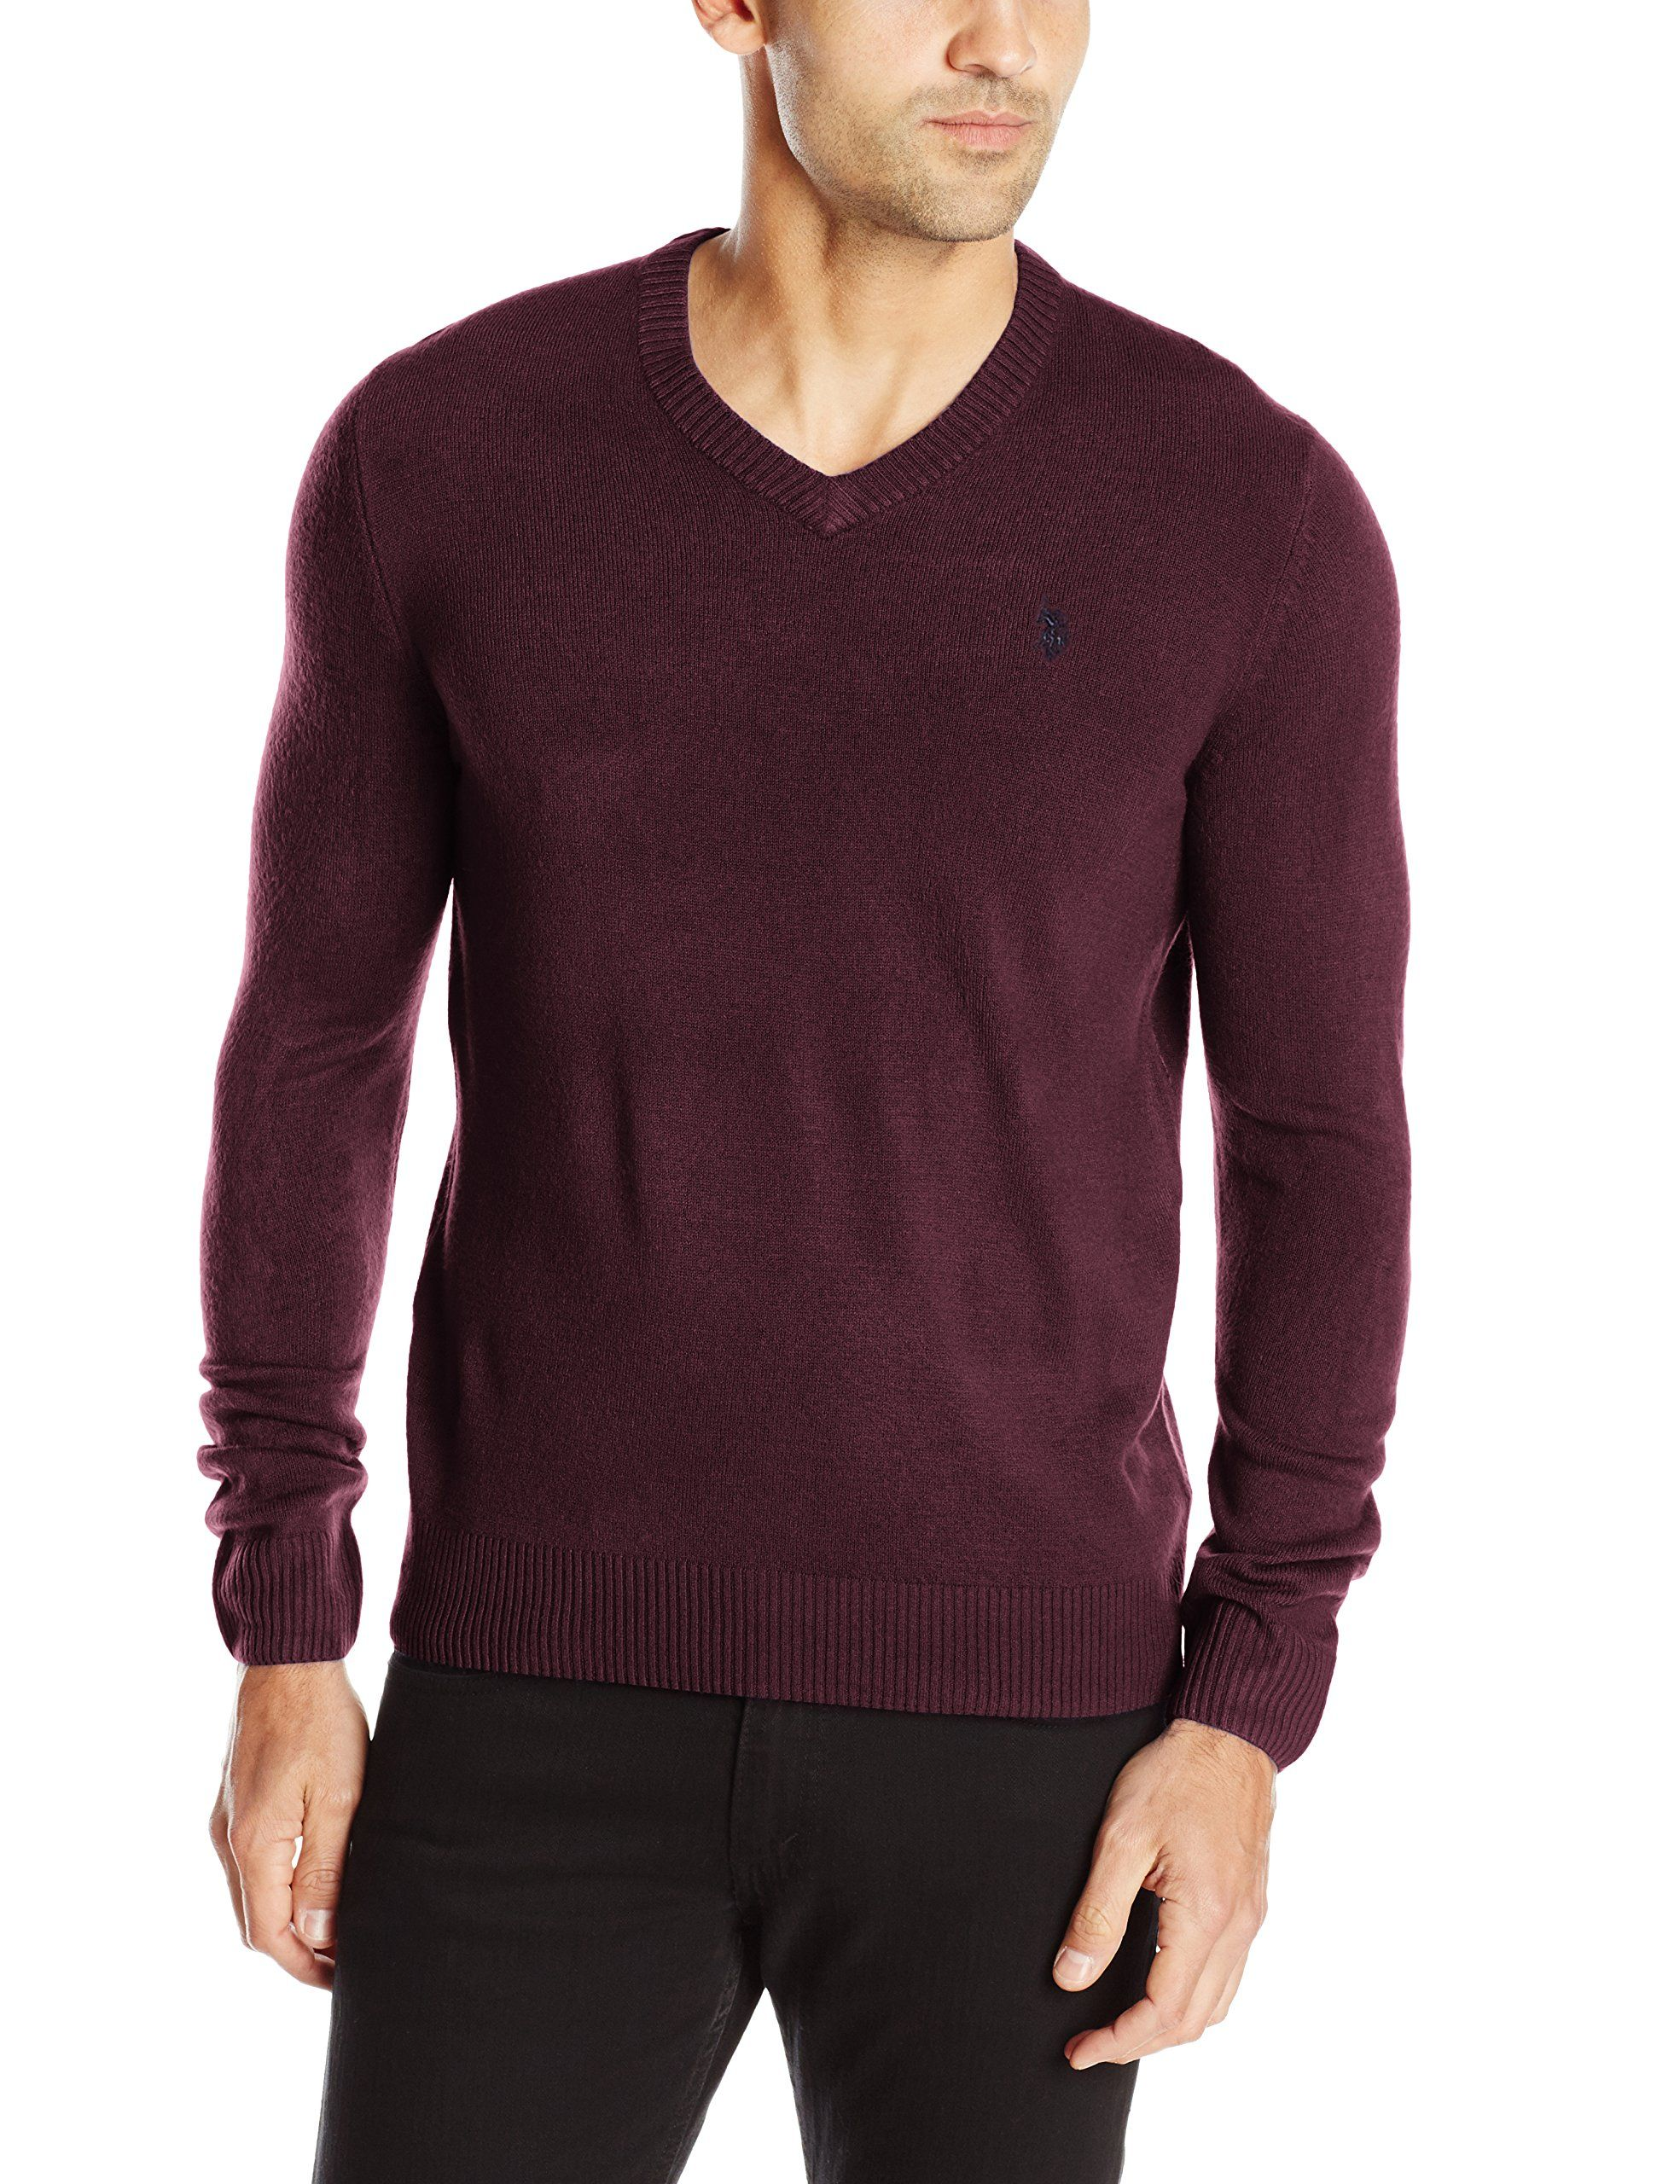 Robot Check Sweaters Vneck Sweater Men Sweater [ 2560 x 1969 Pixel ]